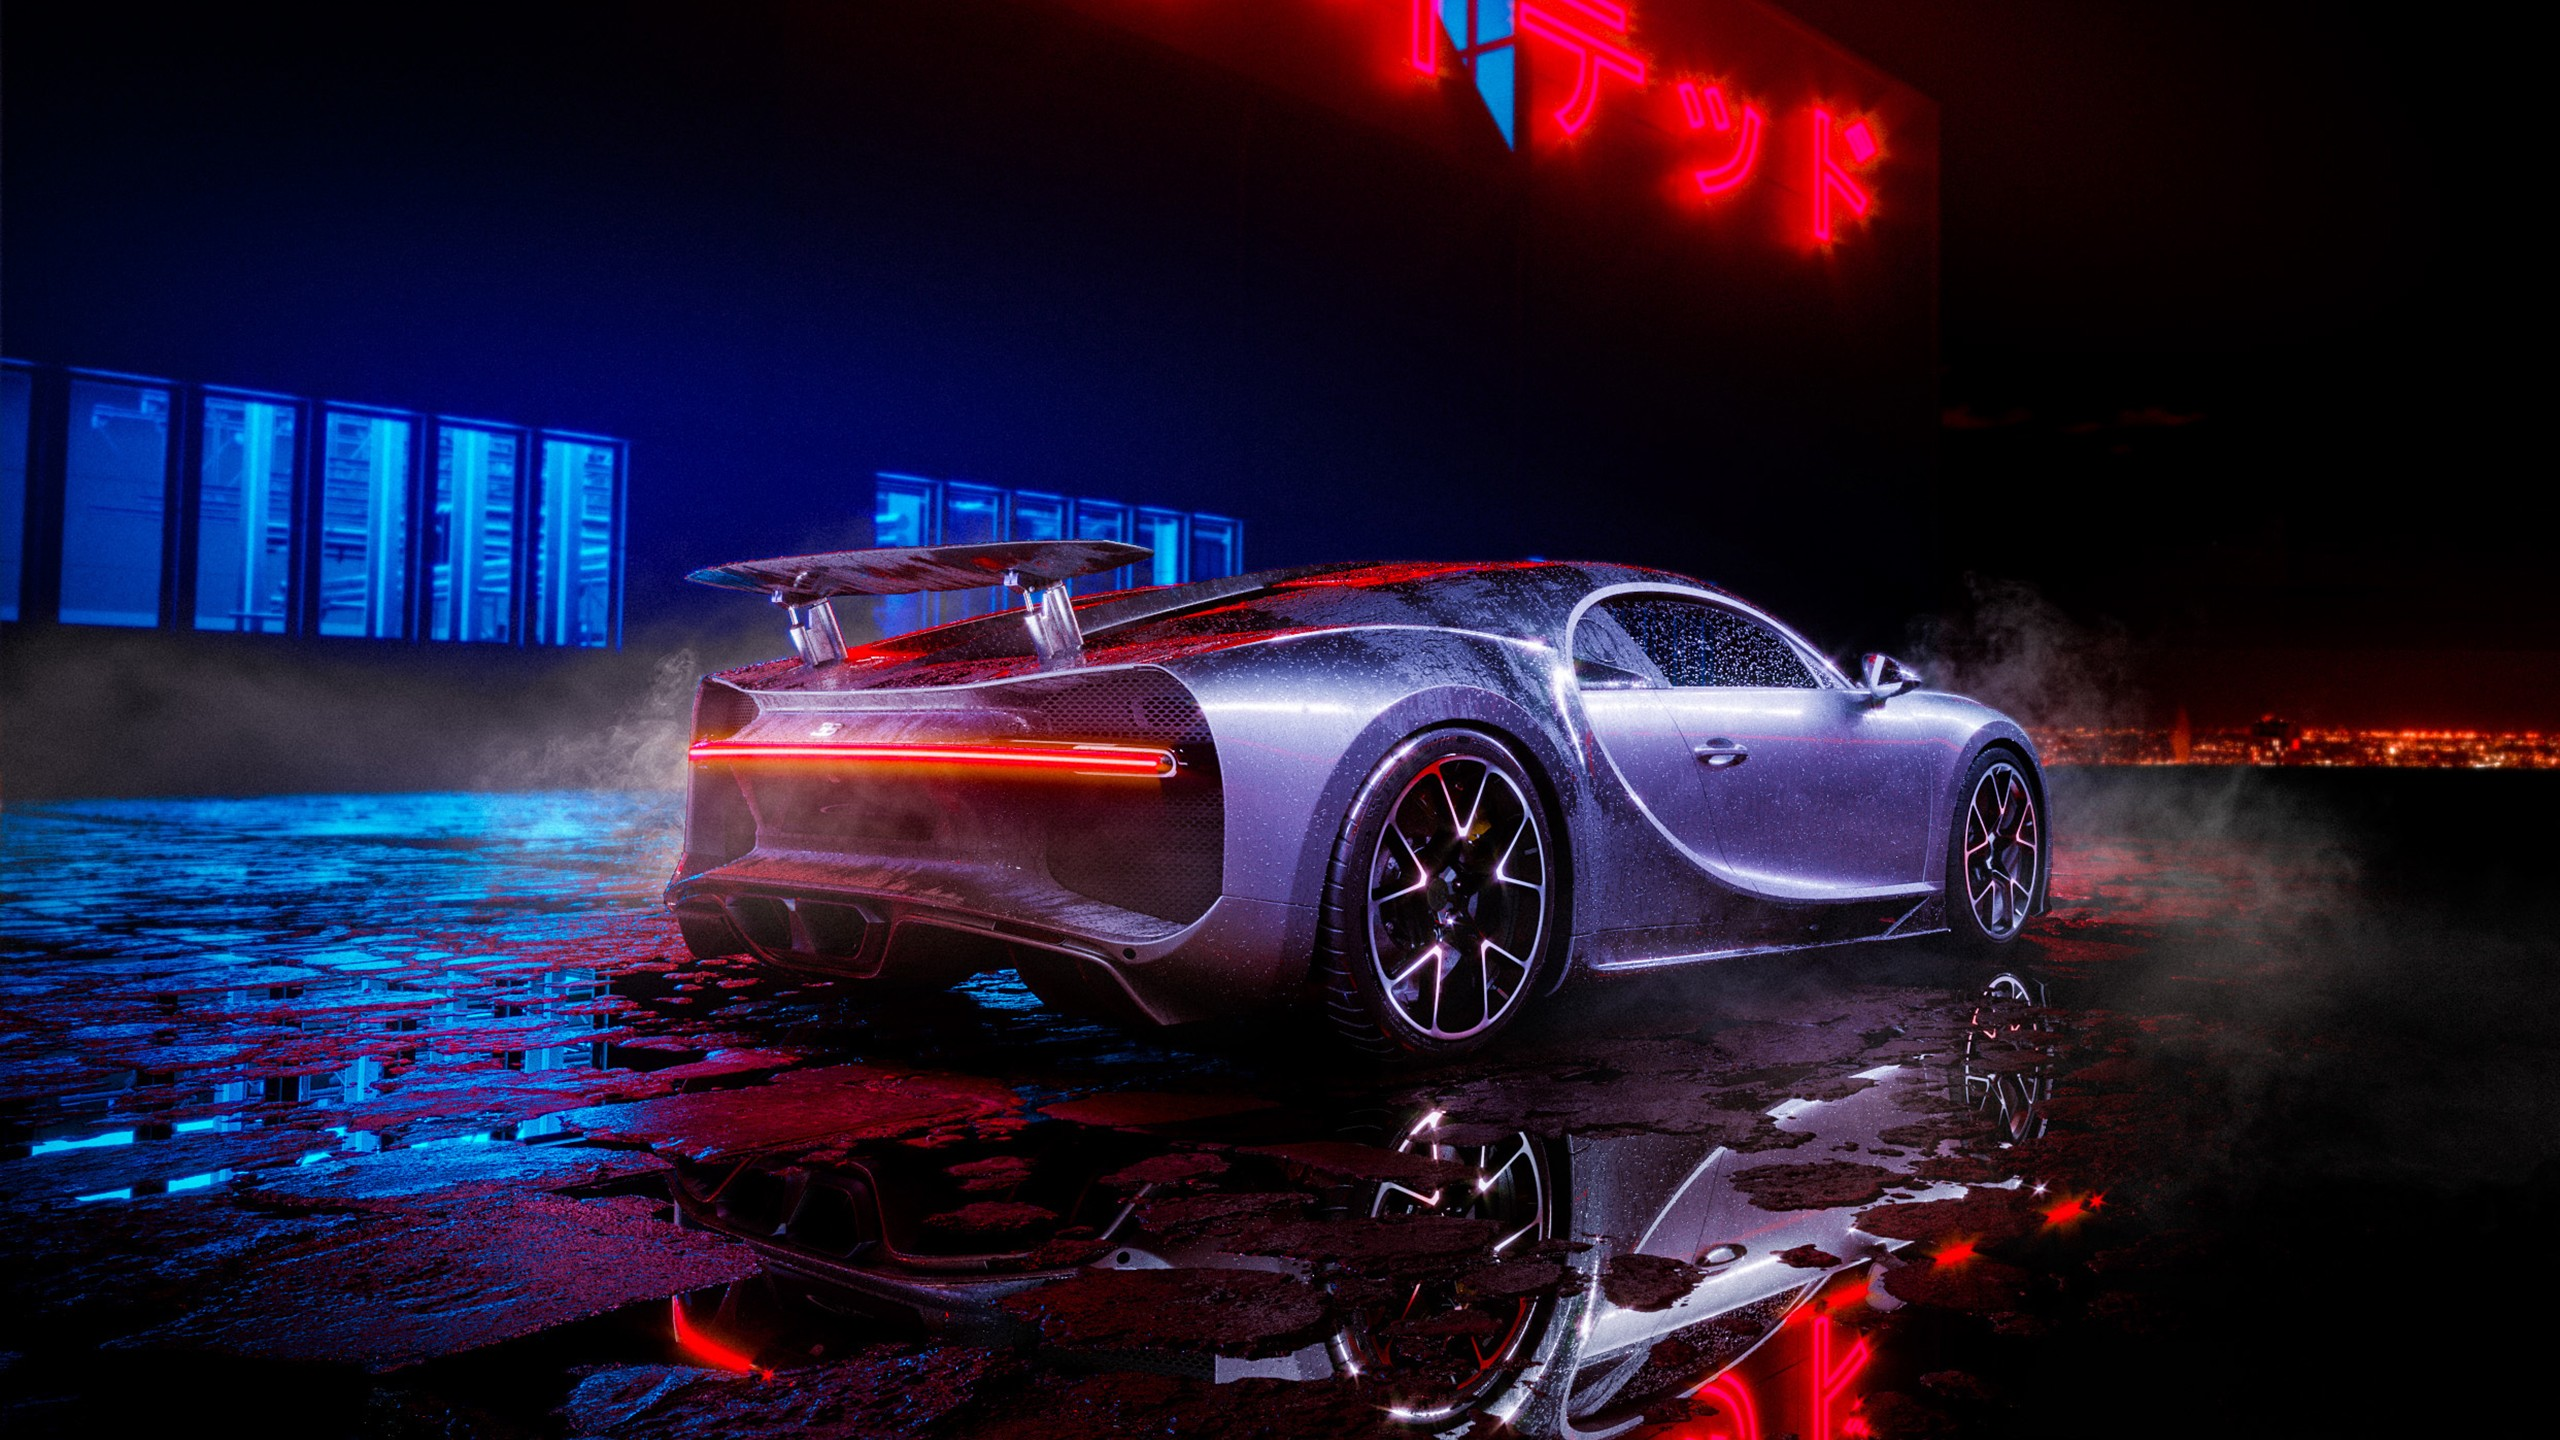 Bugatti Chiron Wallpaper Hd Car Wallpapers Id 11529